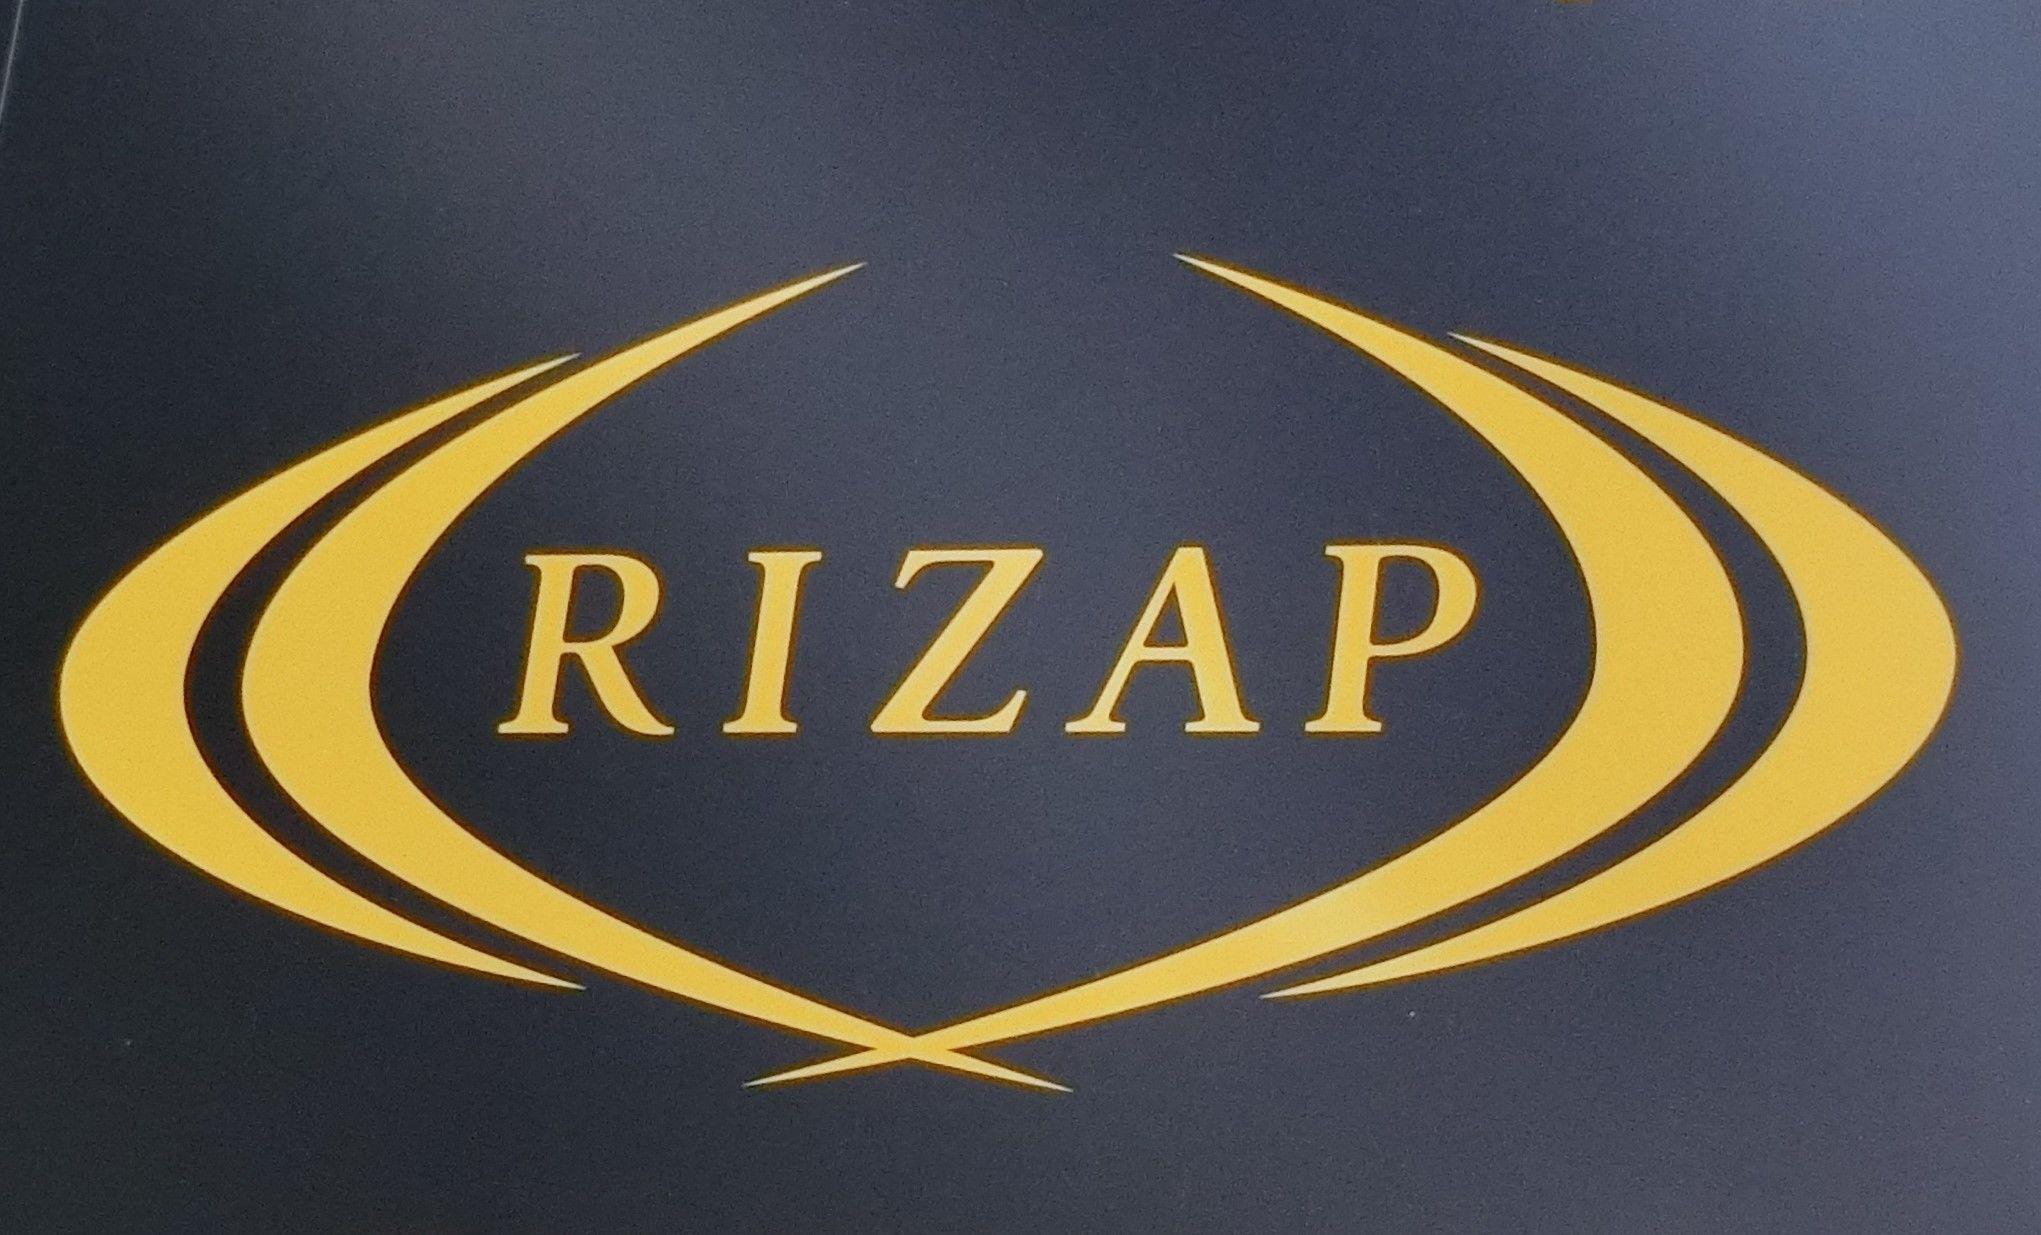 RIZAPが2年連続赤字、「コロナ後に強い会社に生まれ変わる」瀬戸社長